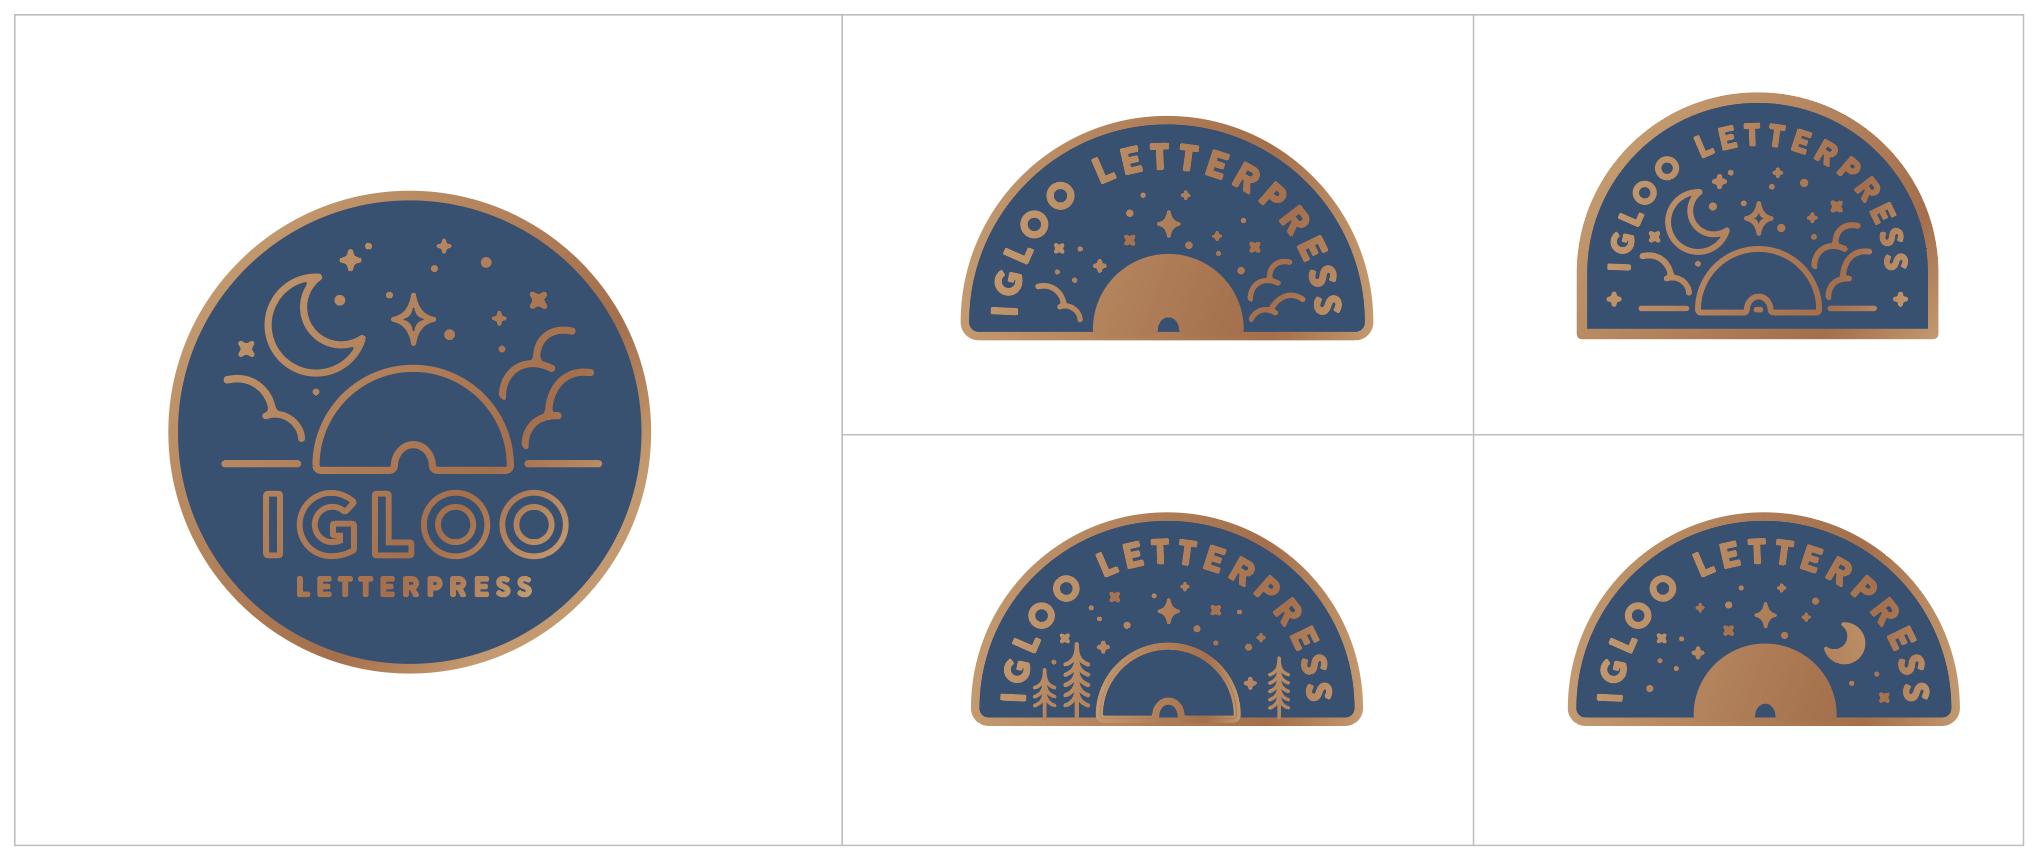 Igloo Letterpress | Enamel Pin Options